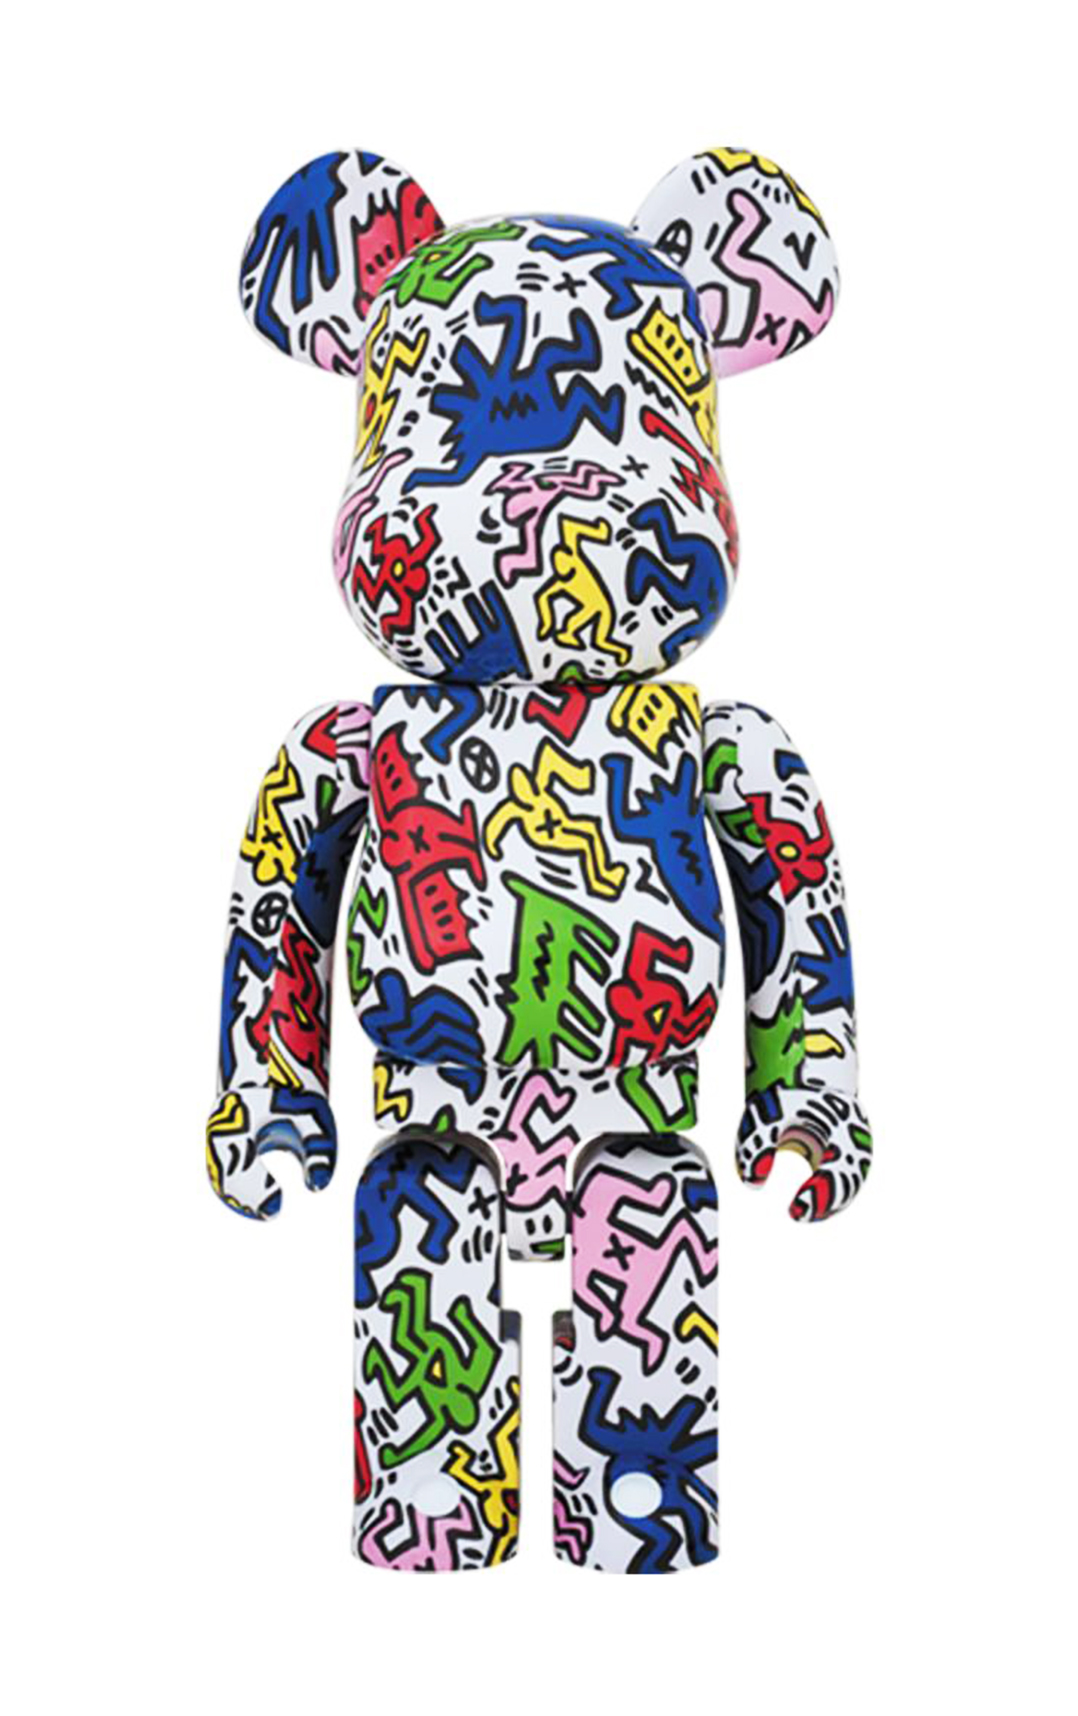 Keith Haring Bearbrick.jpg